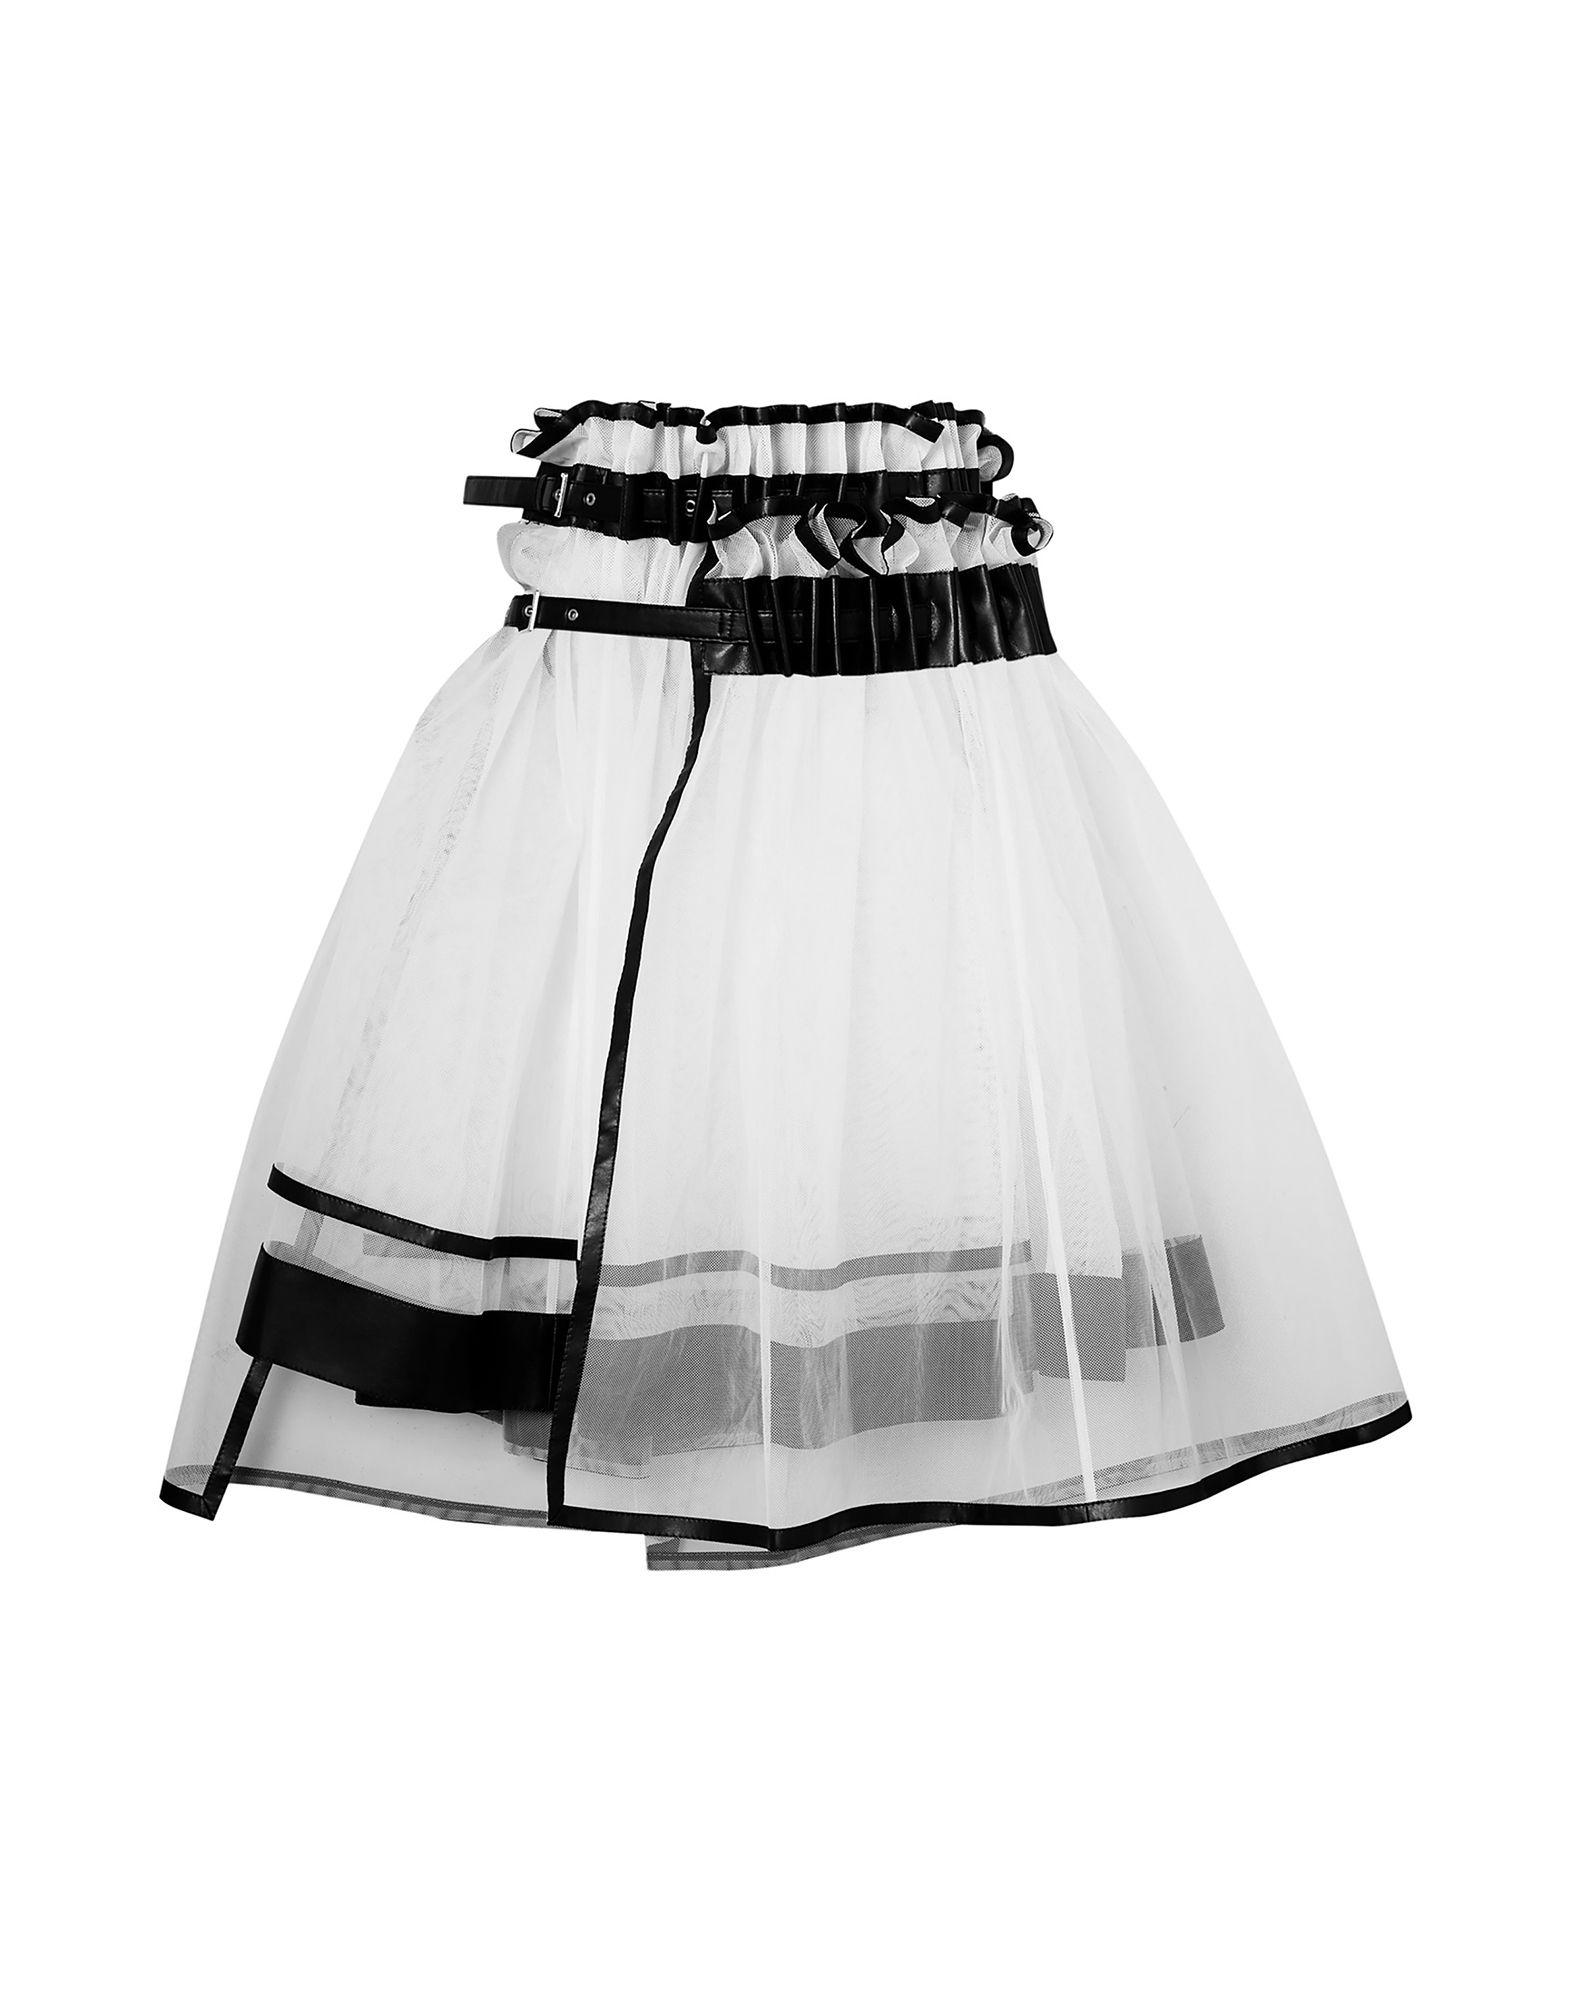 Фото - NOIR KEI NINOMIYA Юбка длиной 3/4 noir kei ninomiya платье длиной 3 4